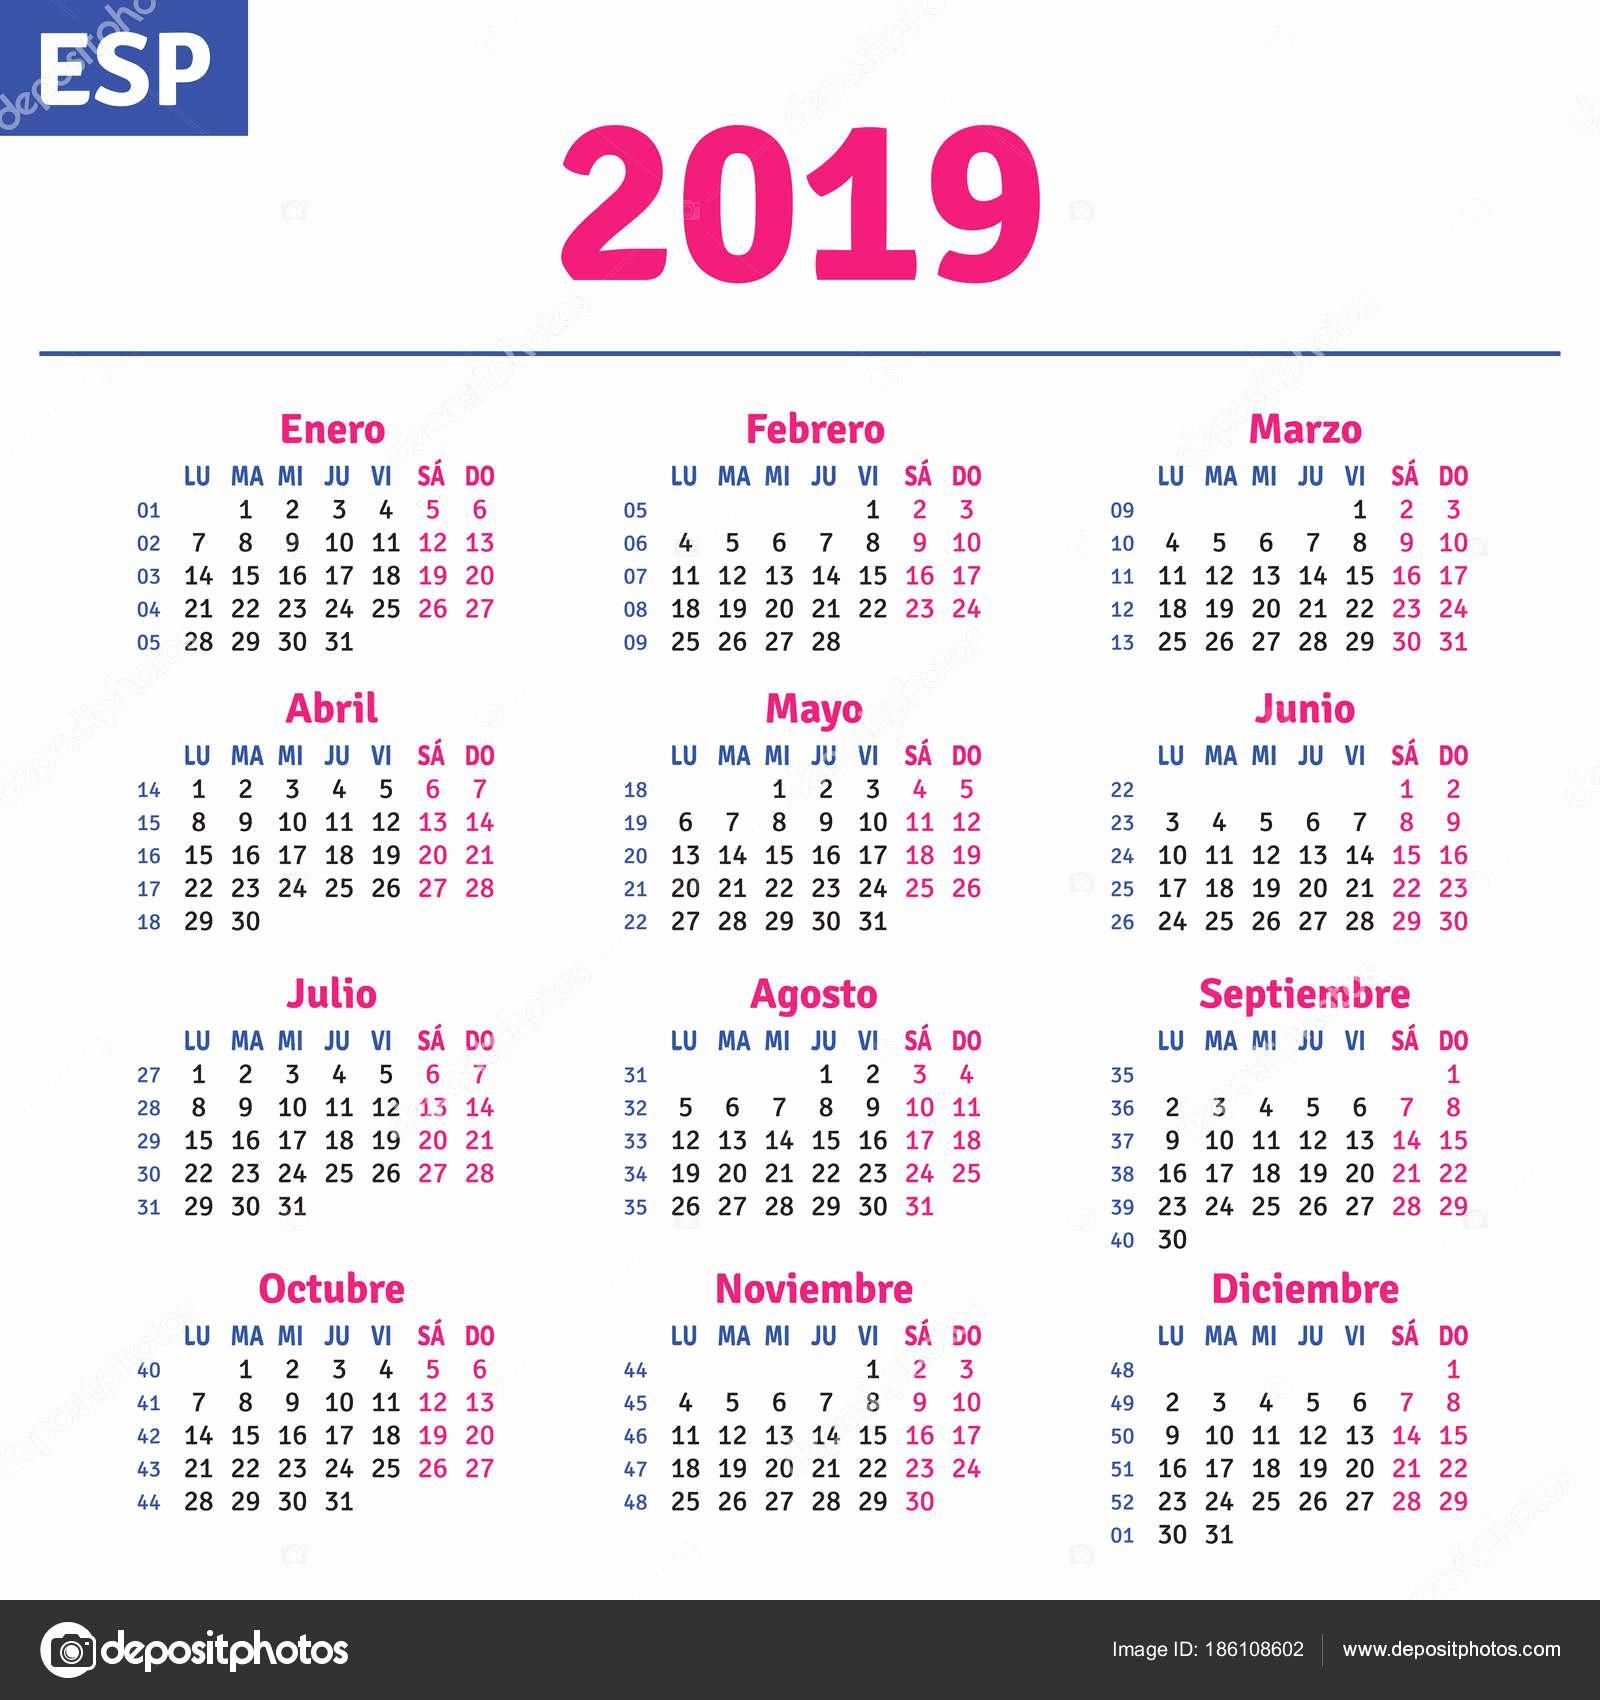 Calendario Dr 2019 Espanol Calendario 2019 Archivo Imagenes